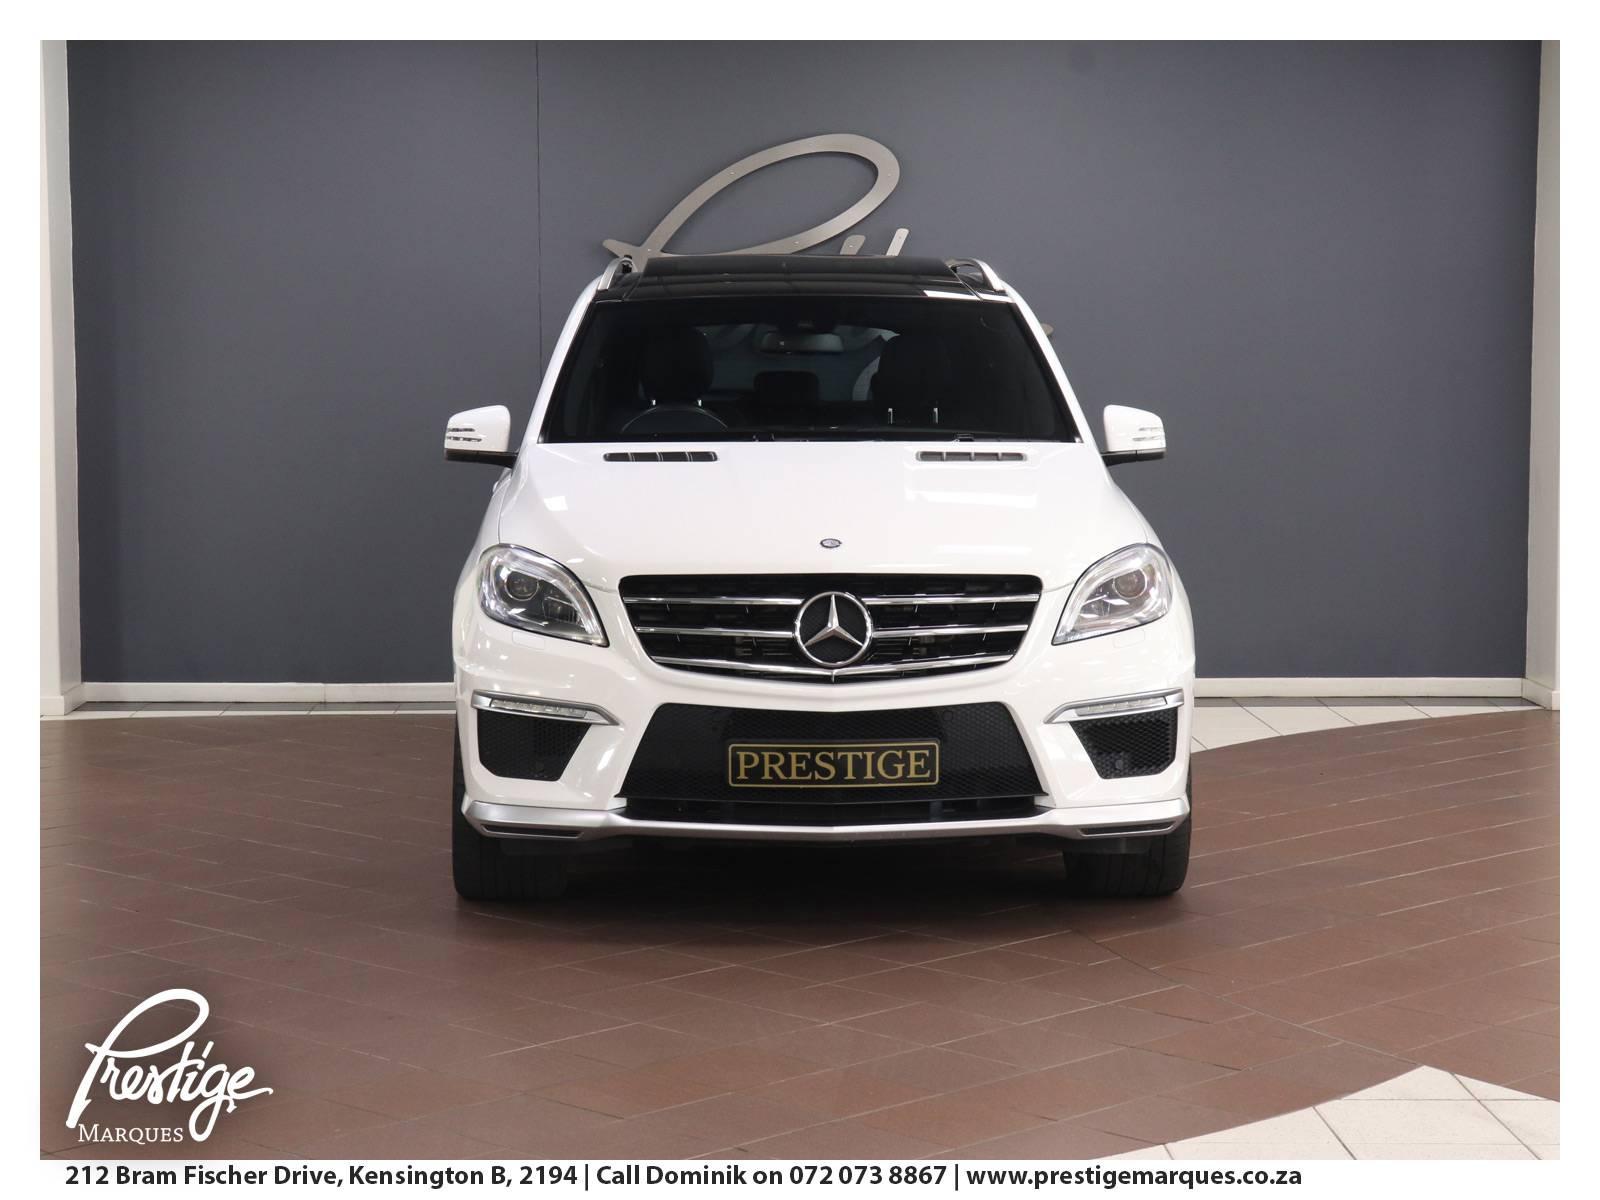 2015-Mercedes-Benz-ML63-AMG-Prestige-Marques-Randburg-Sandton-7